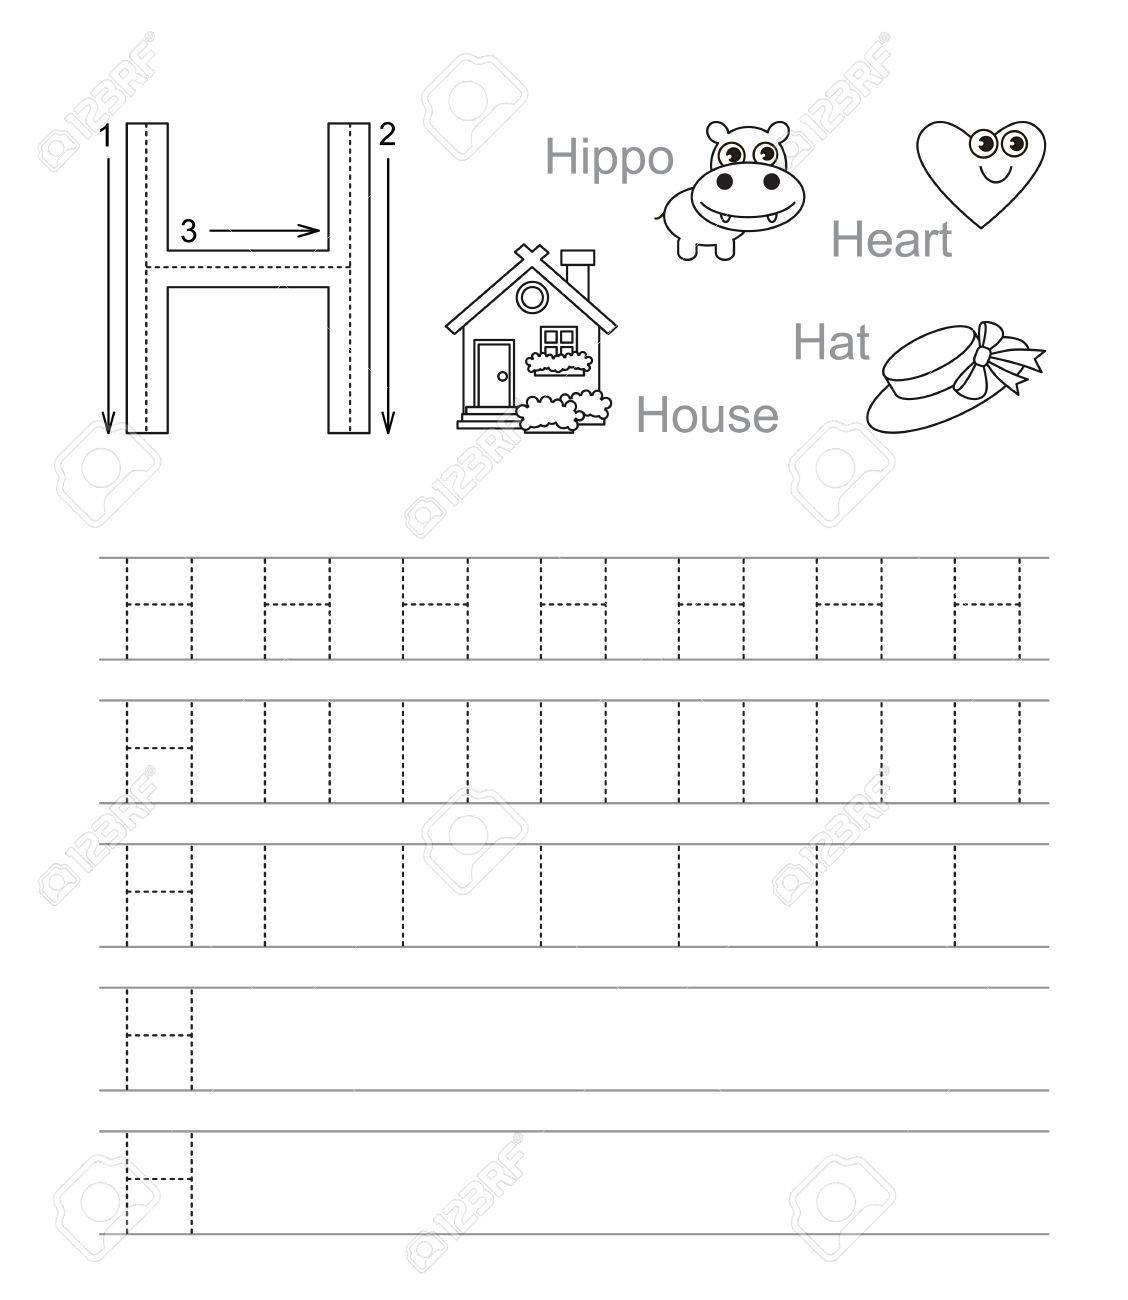 Letter H Tracing Worksheets